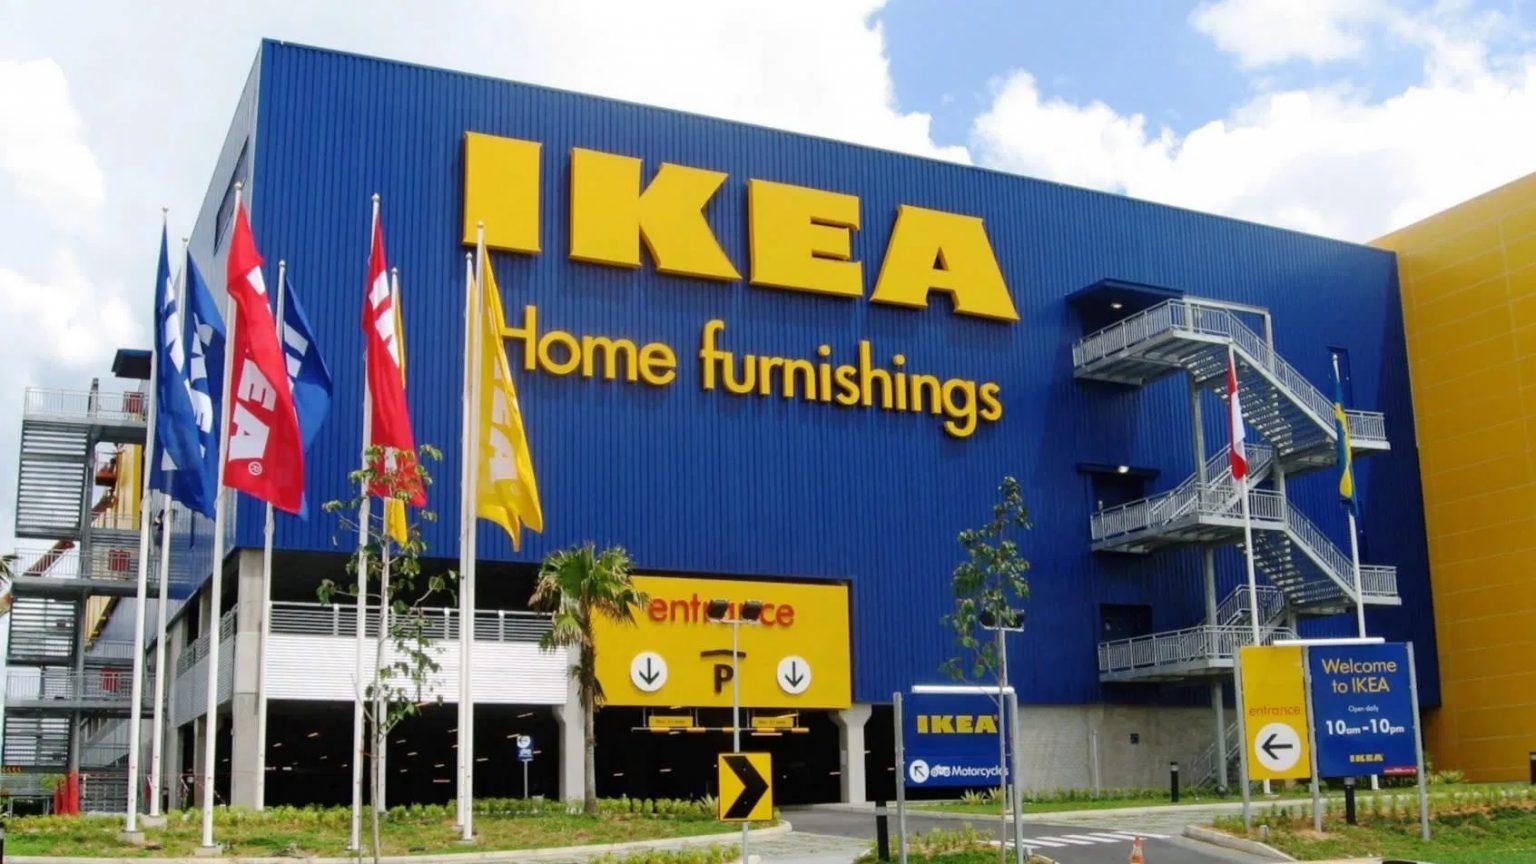 IKEA Spying